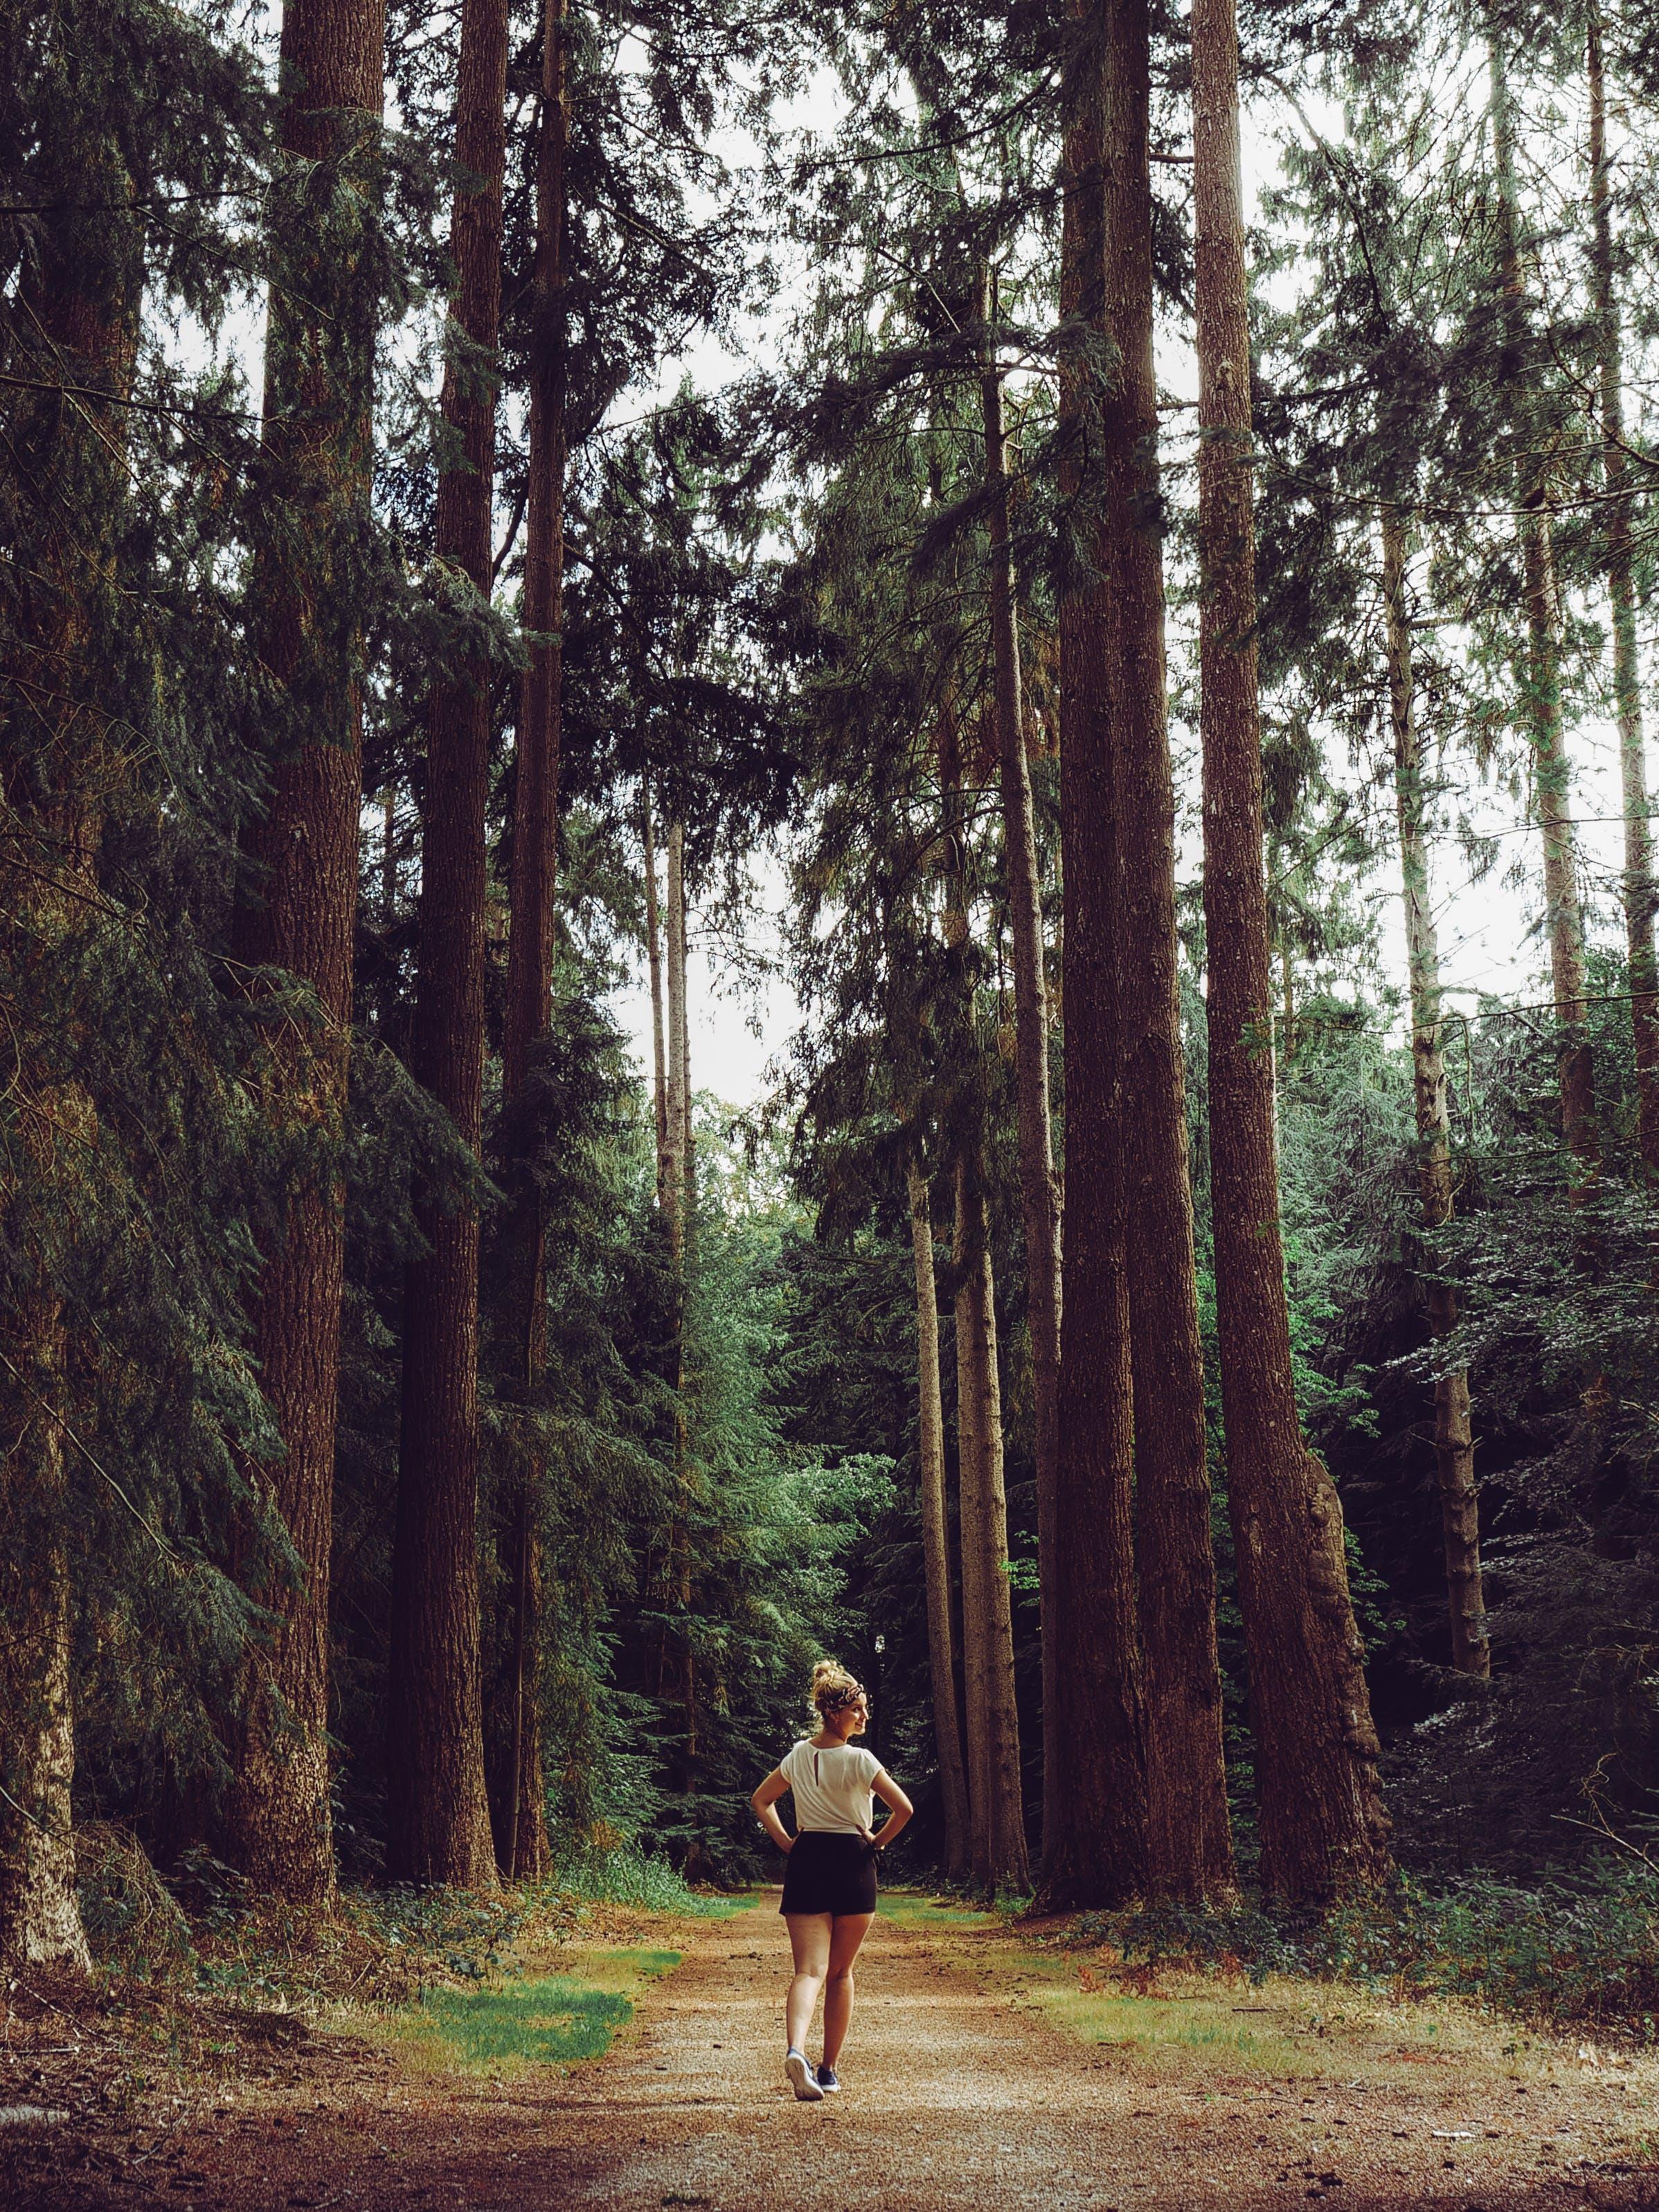 Woman Walking Pathway Between Green Leafed Trees